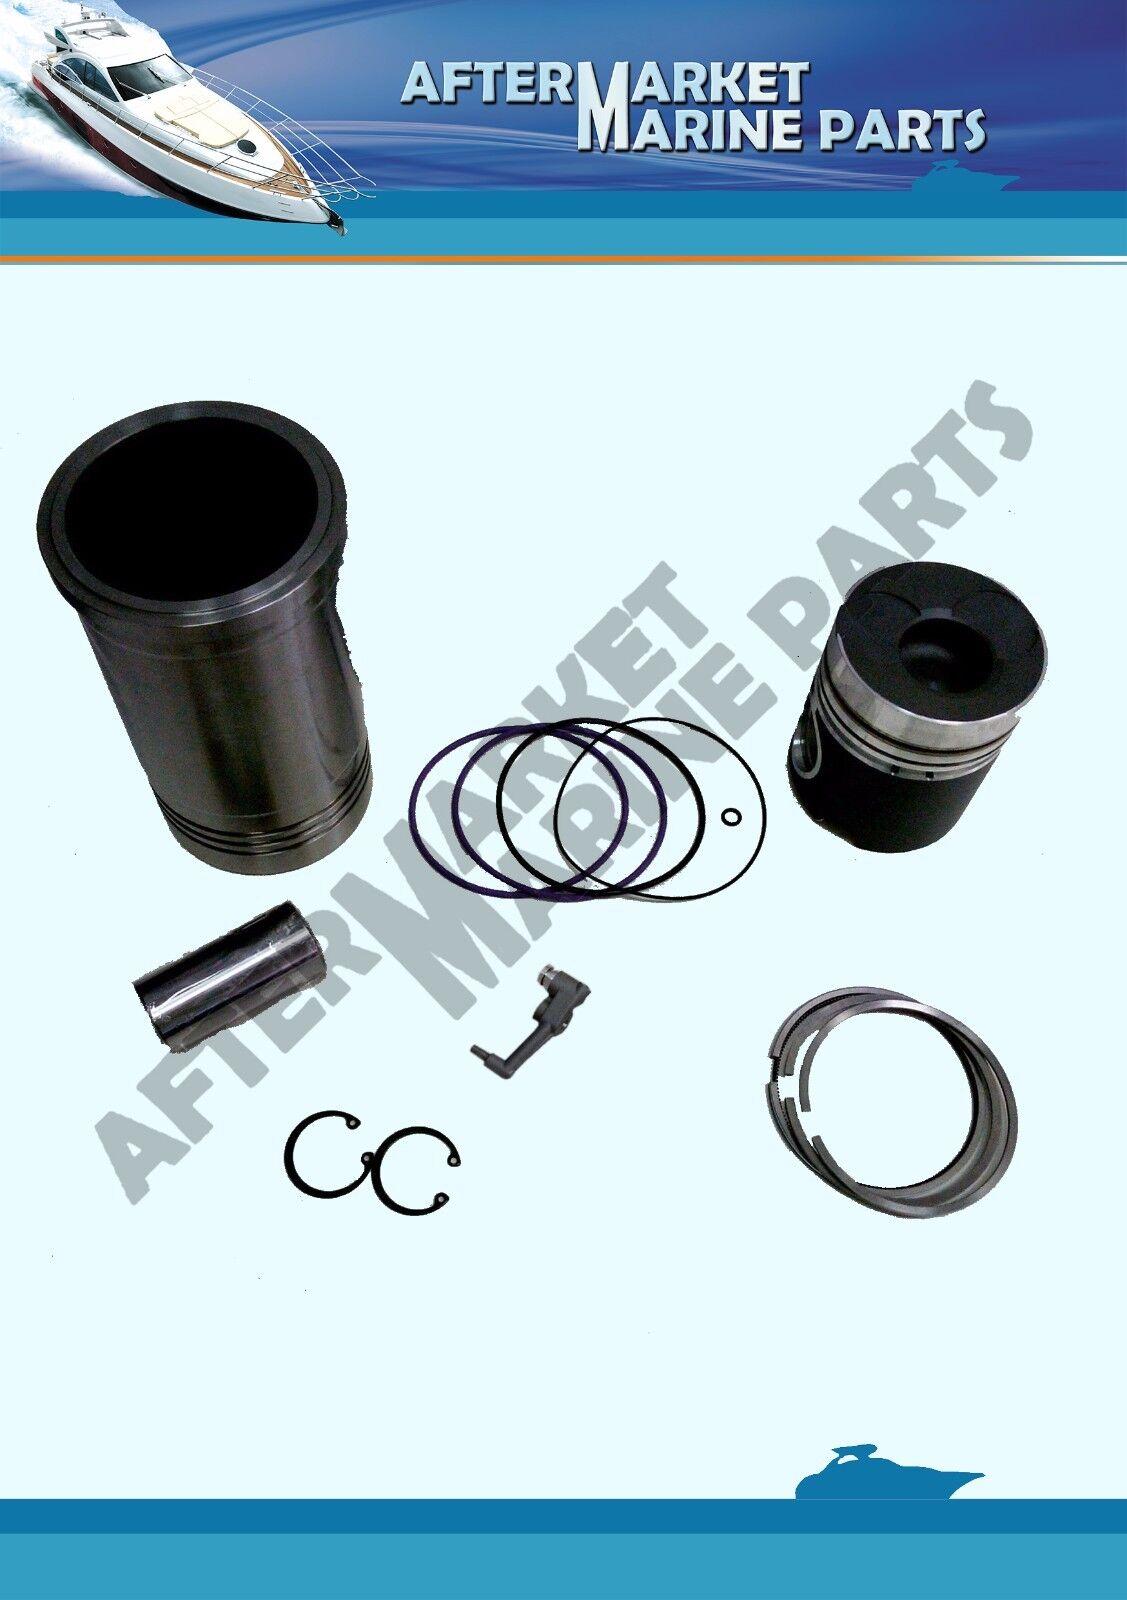 Cylinder Liner Kit for VOLVO Penta 31 41 Replaces 876099 867975 ...